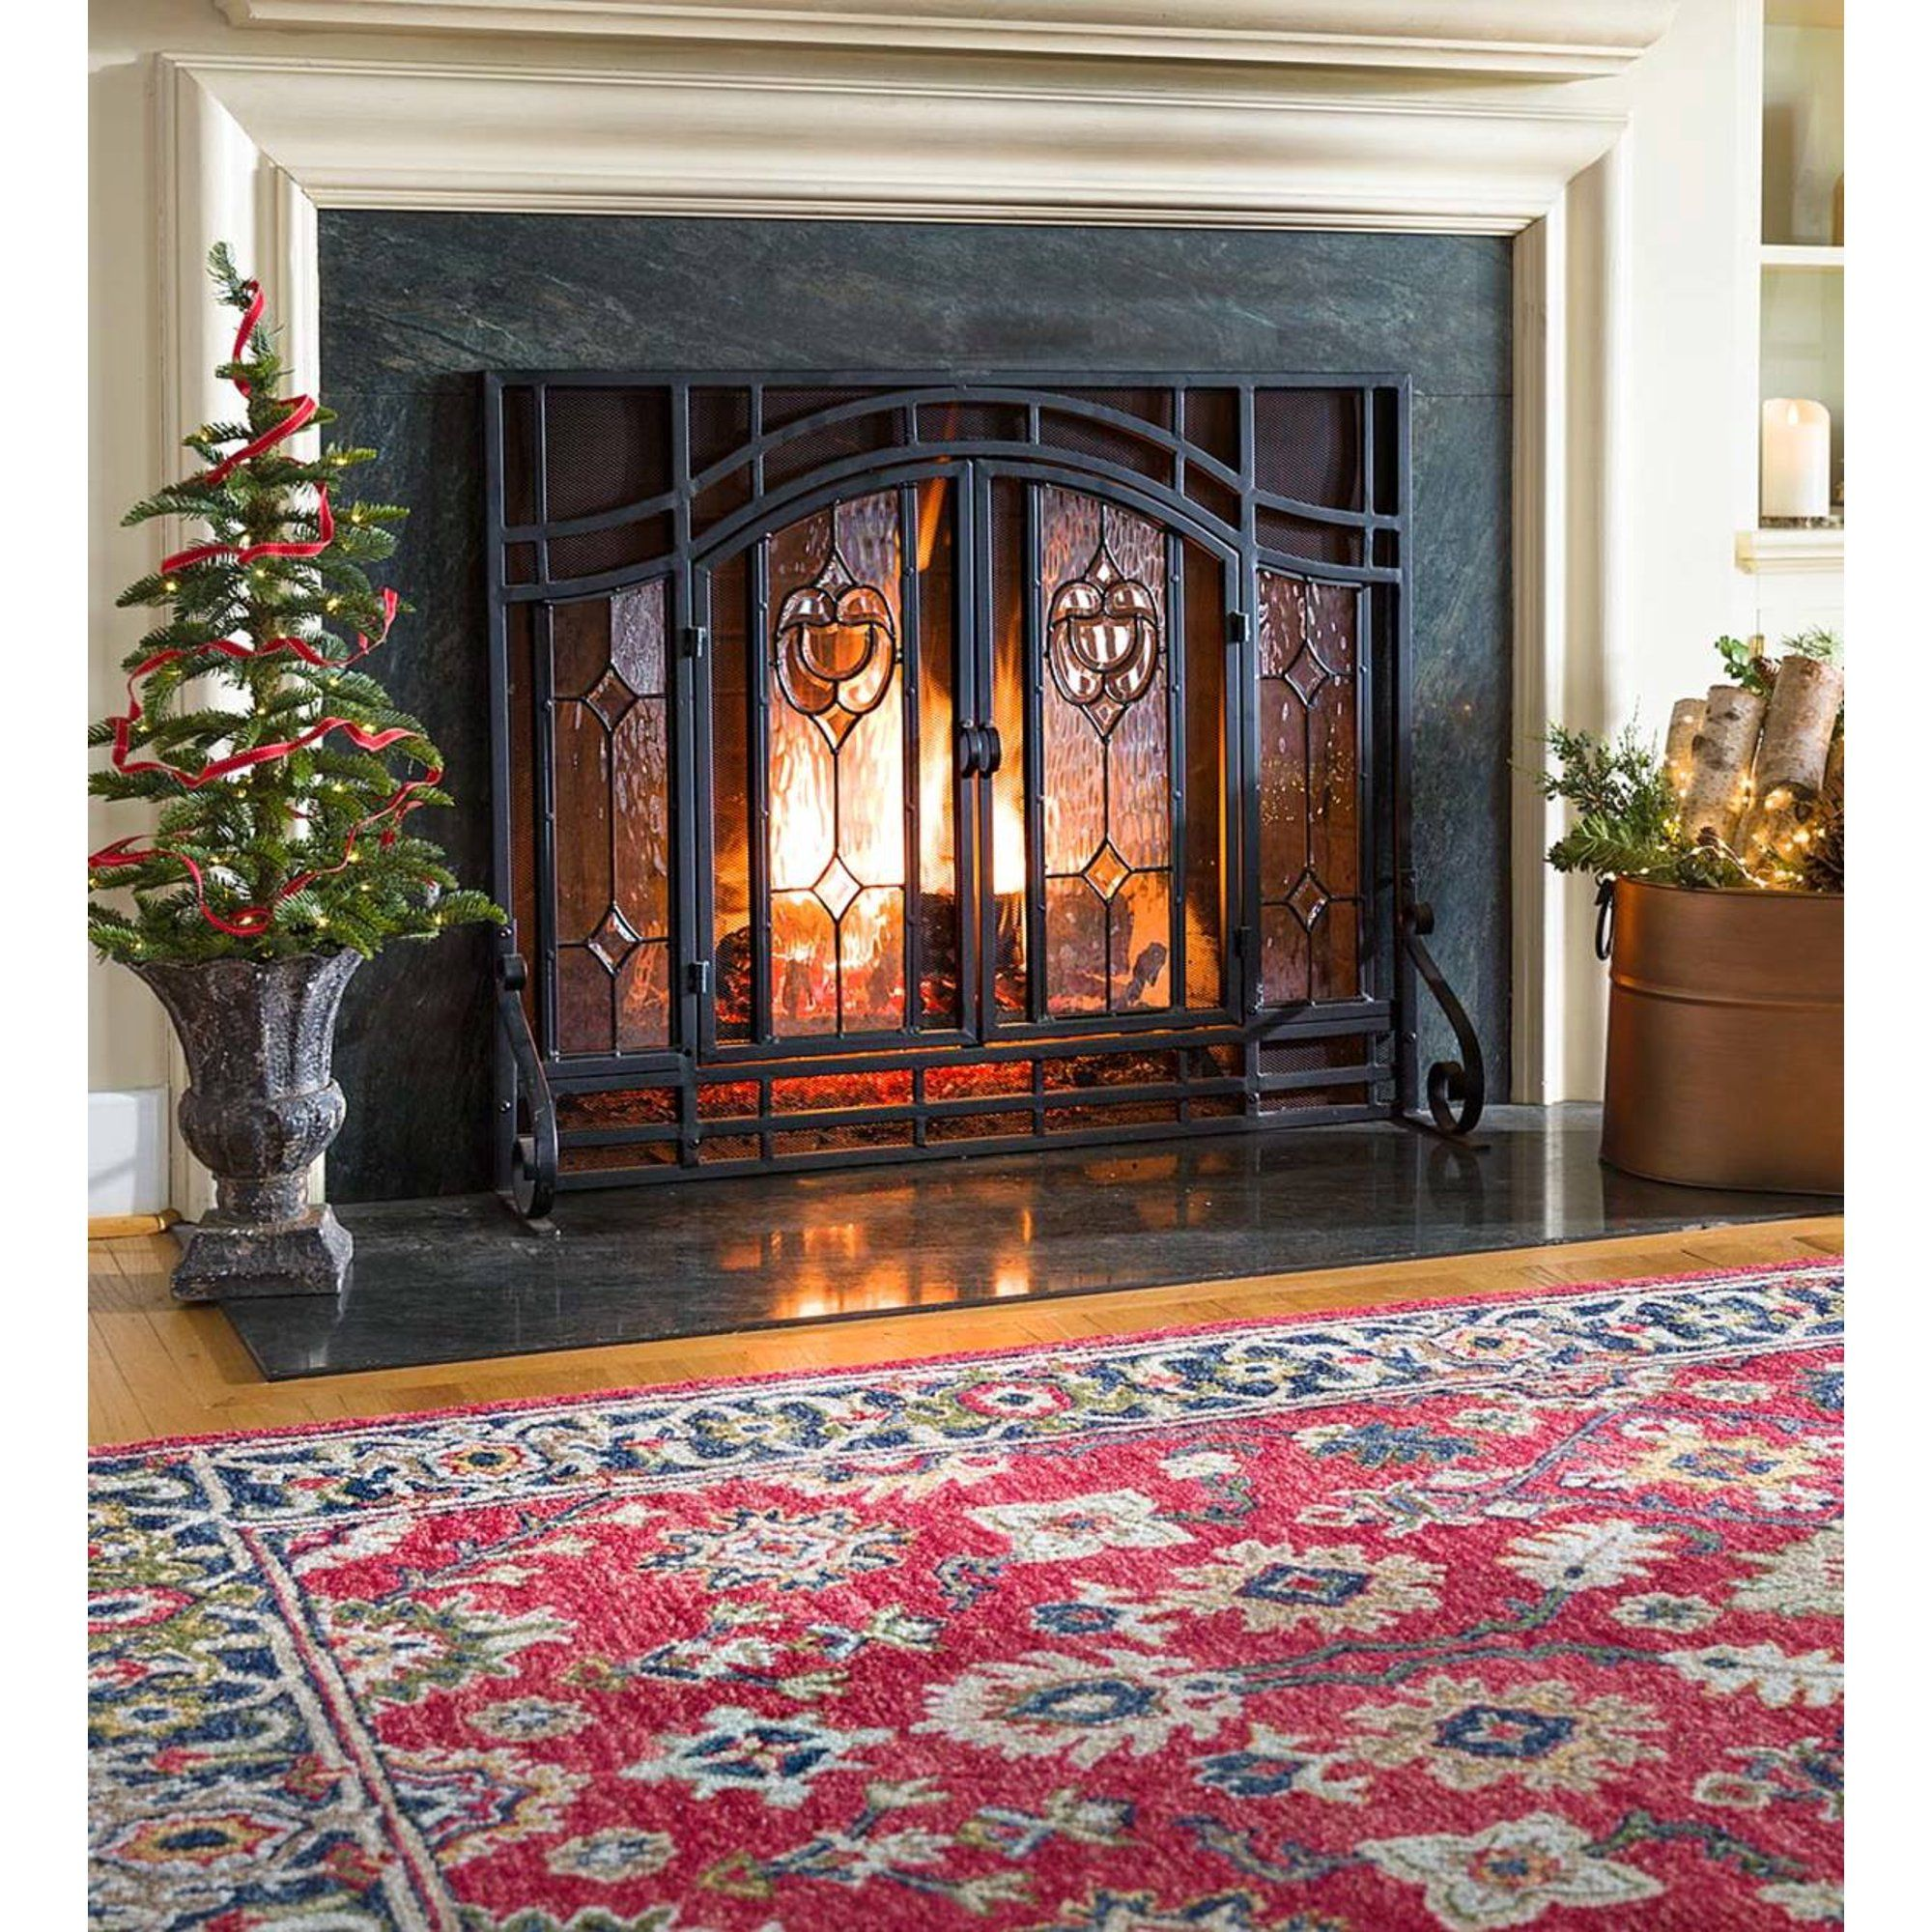 2 Door Floral Fireplace Fire Screen With Beveled Glass Panels Black Walmart Com Fireplace Screens With Doors Glass Fireplace Glass Fireplace Screen